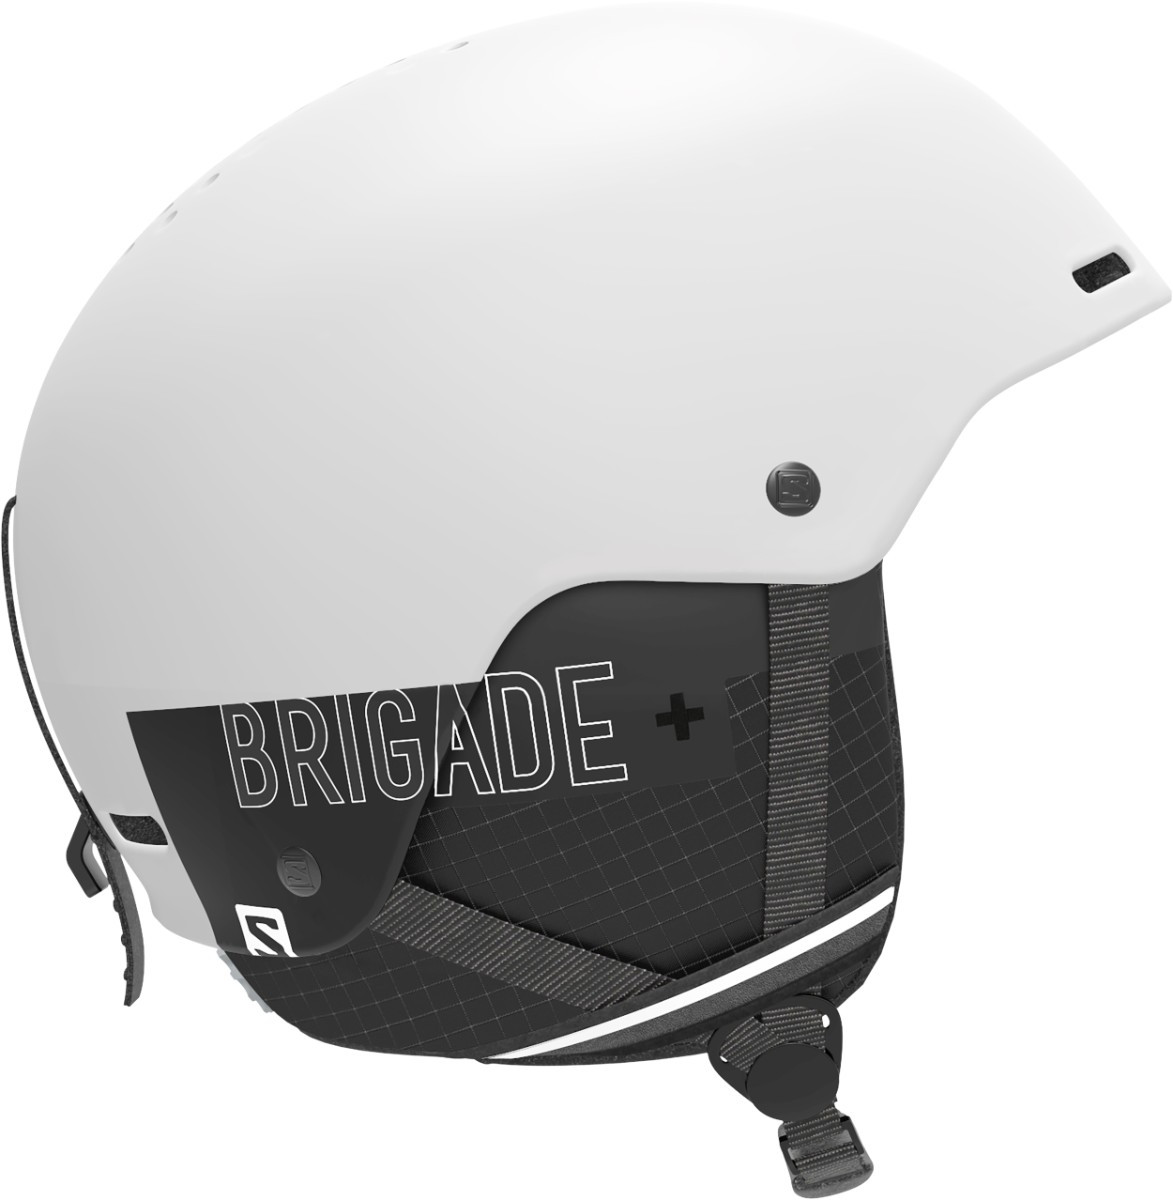 Salomon Brigade+ - bílá Velikost helmy: M 2019/2020